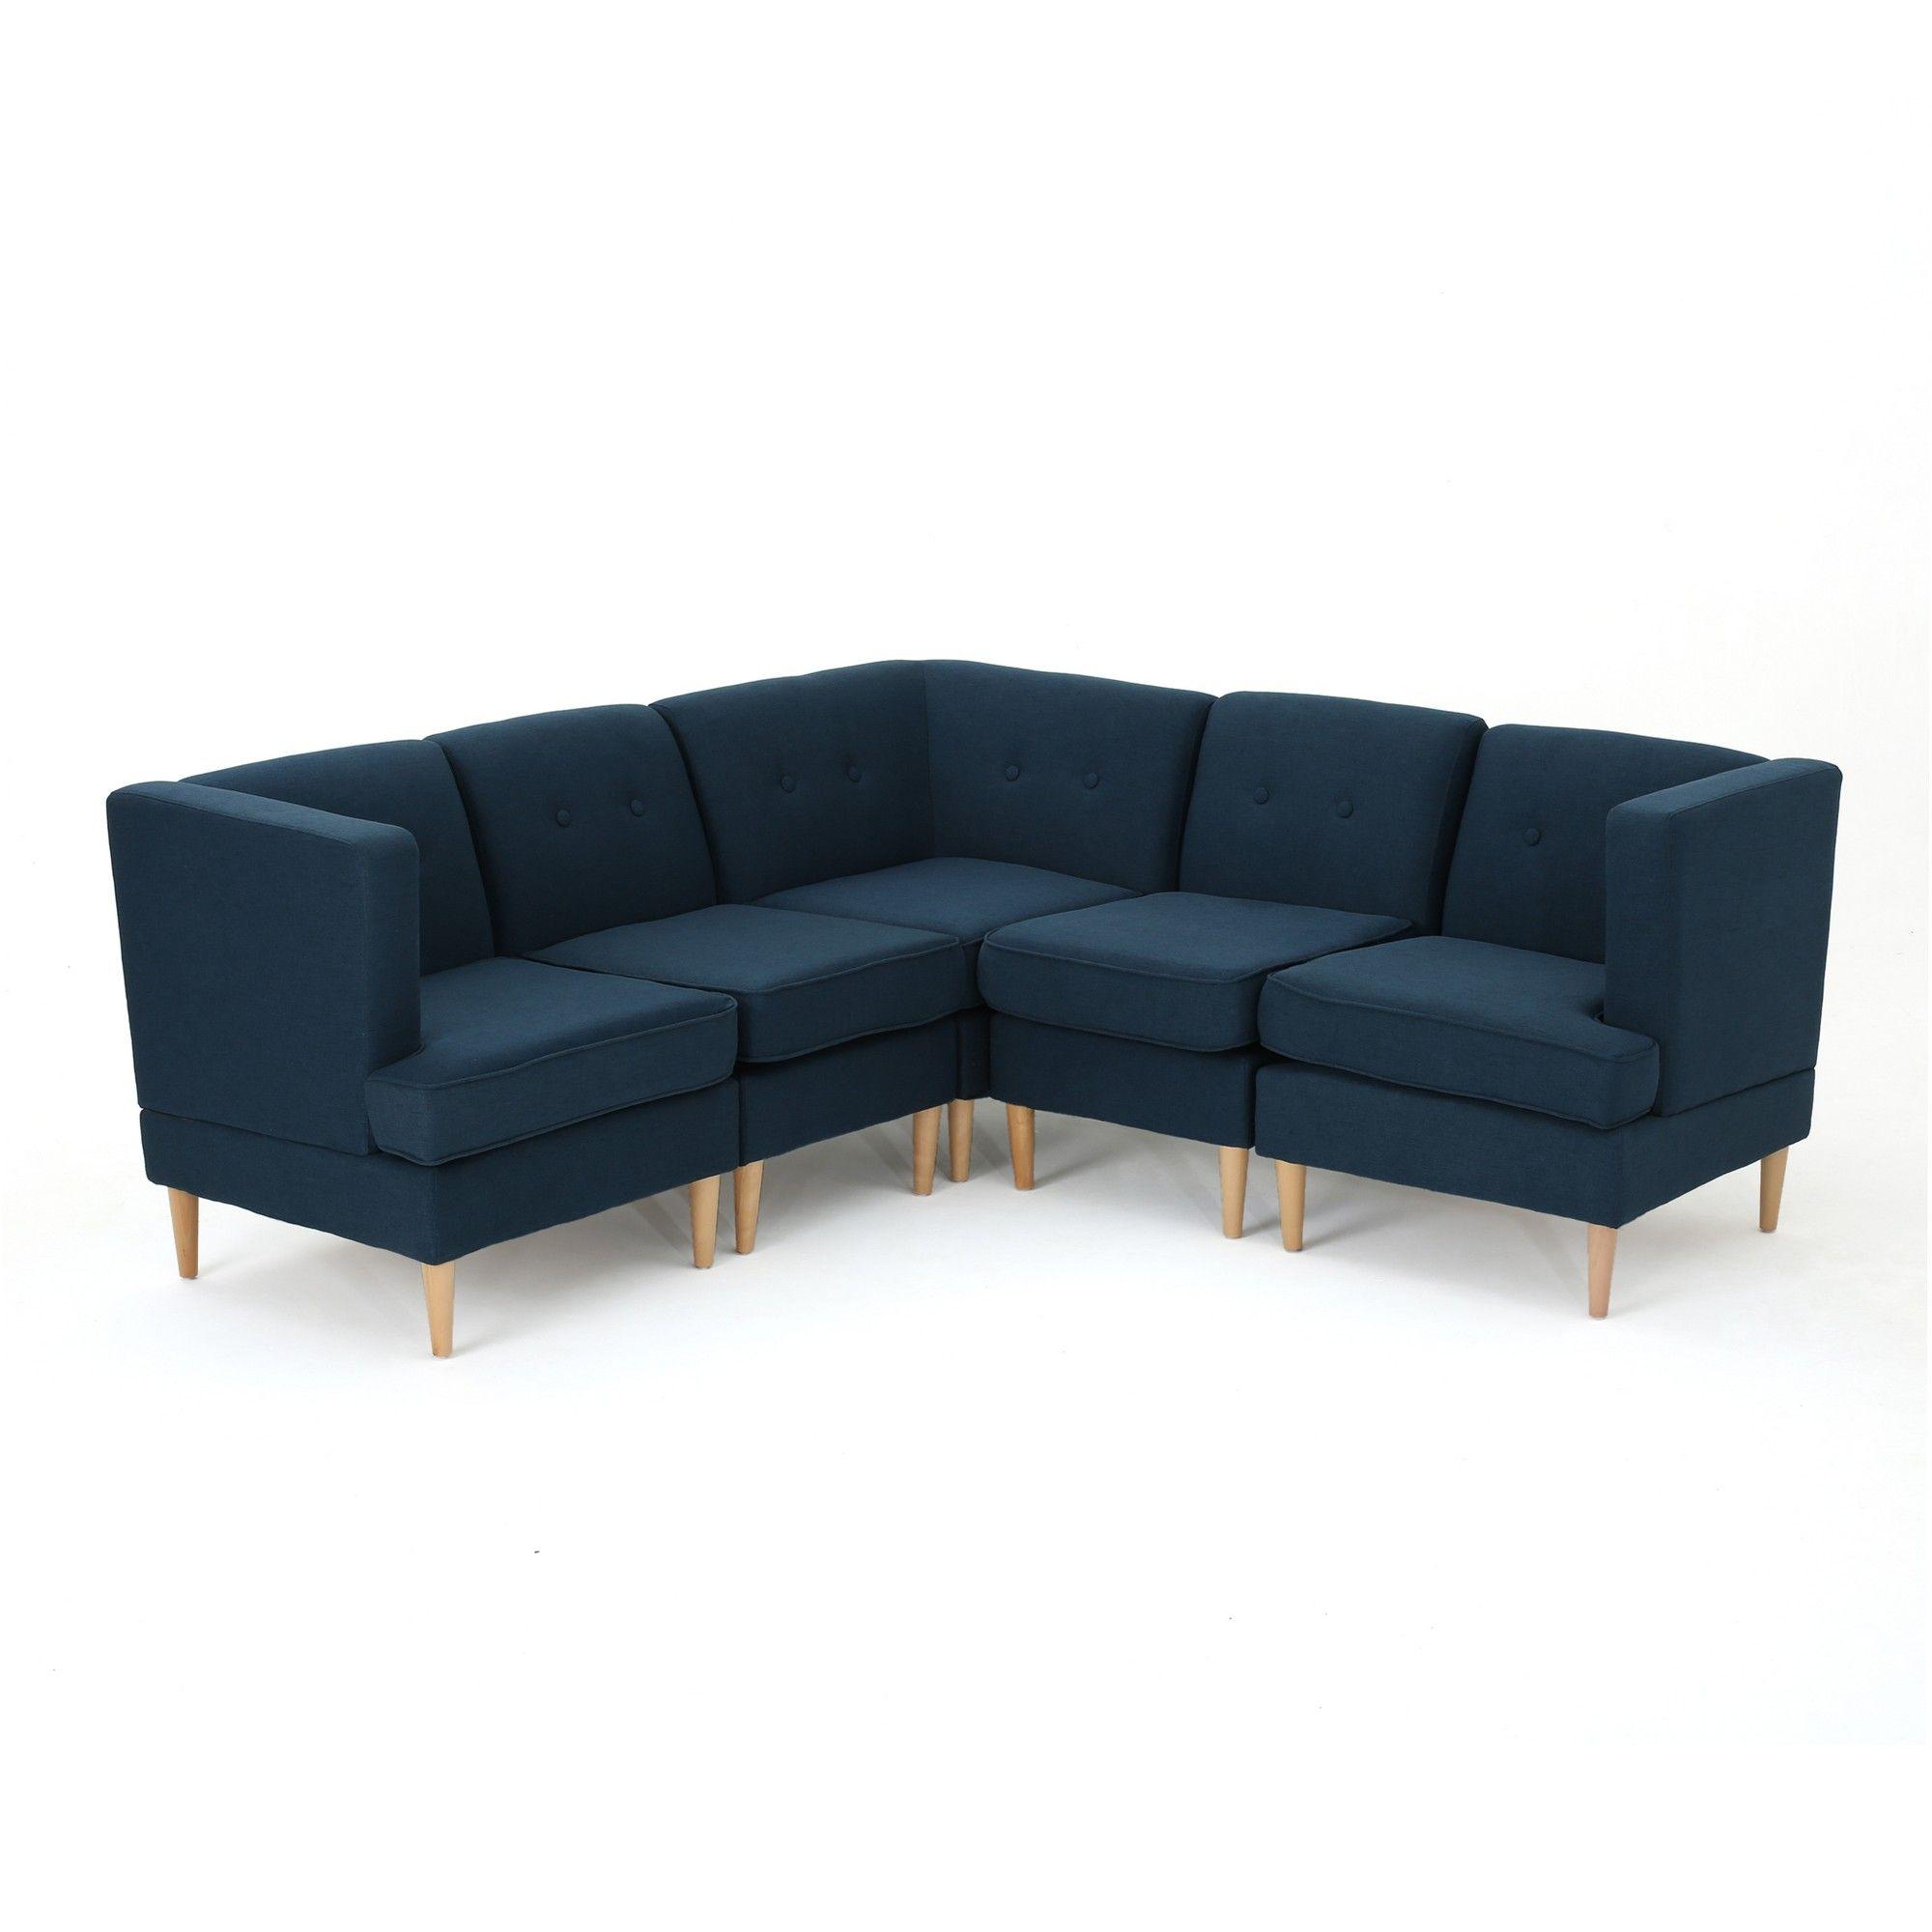 Pleasant 5Pc Milton Sectional Sofa Set Navy Blue Christopher Knight Inzonedesignstudio Interior Chair Design Inzonedesignstudiocom